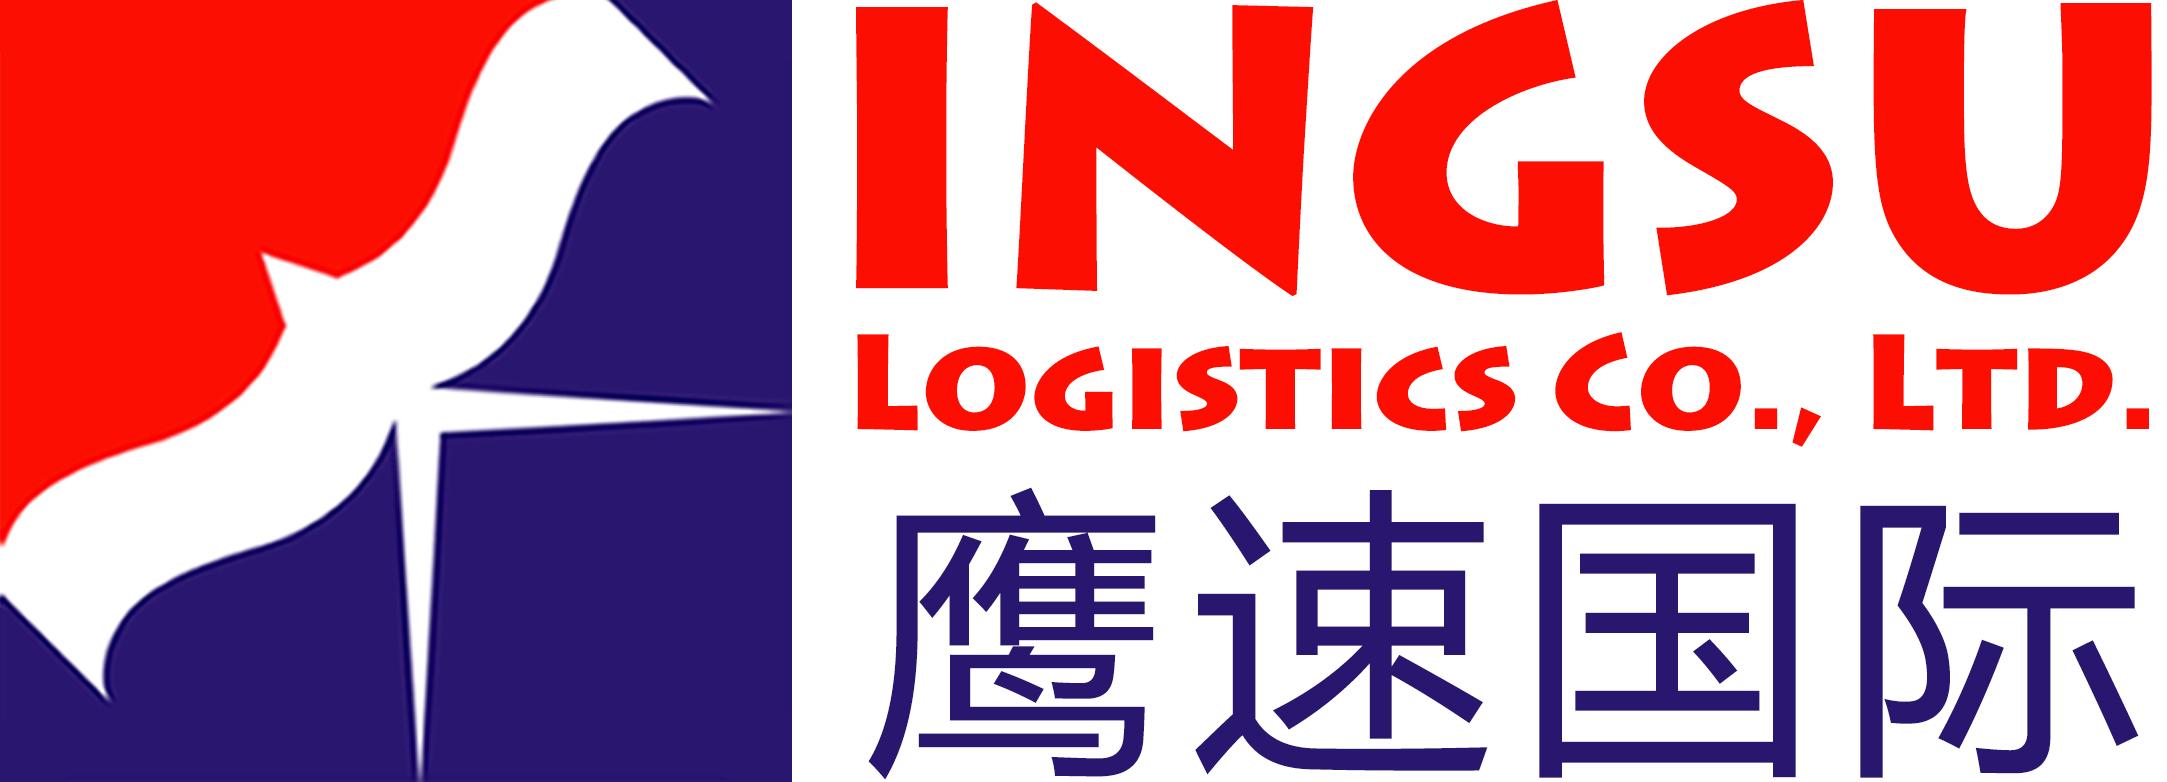 English / About us_Myanmar logistics company,Laos logistics